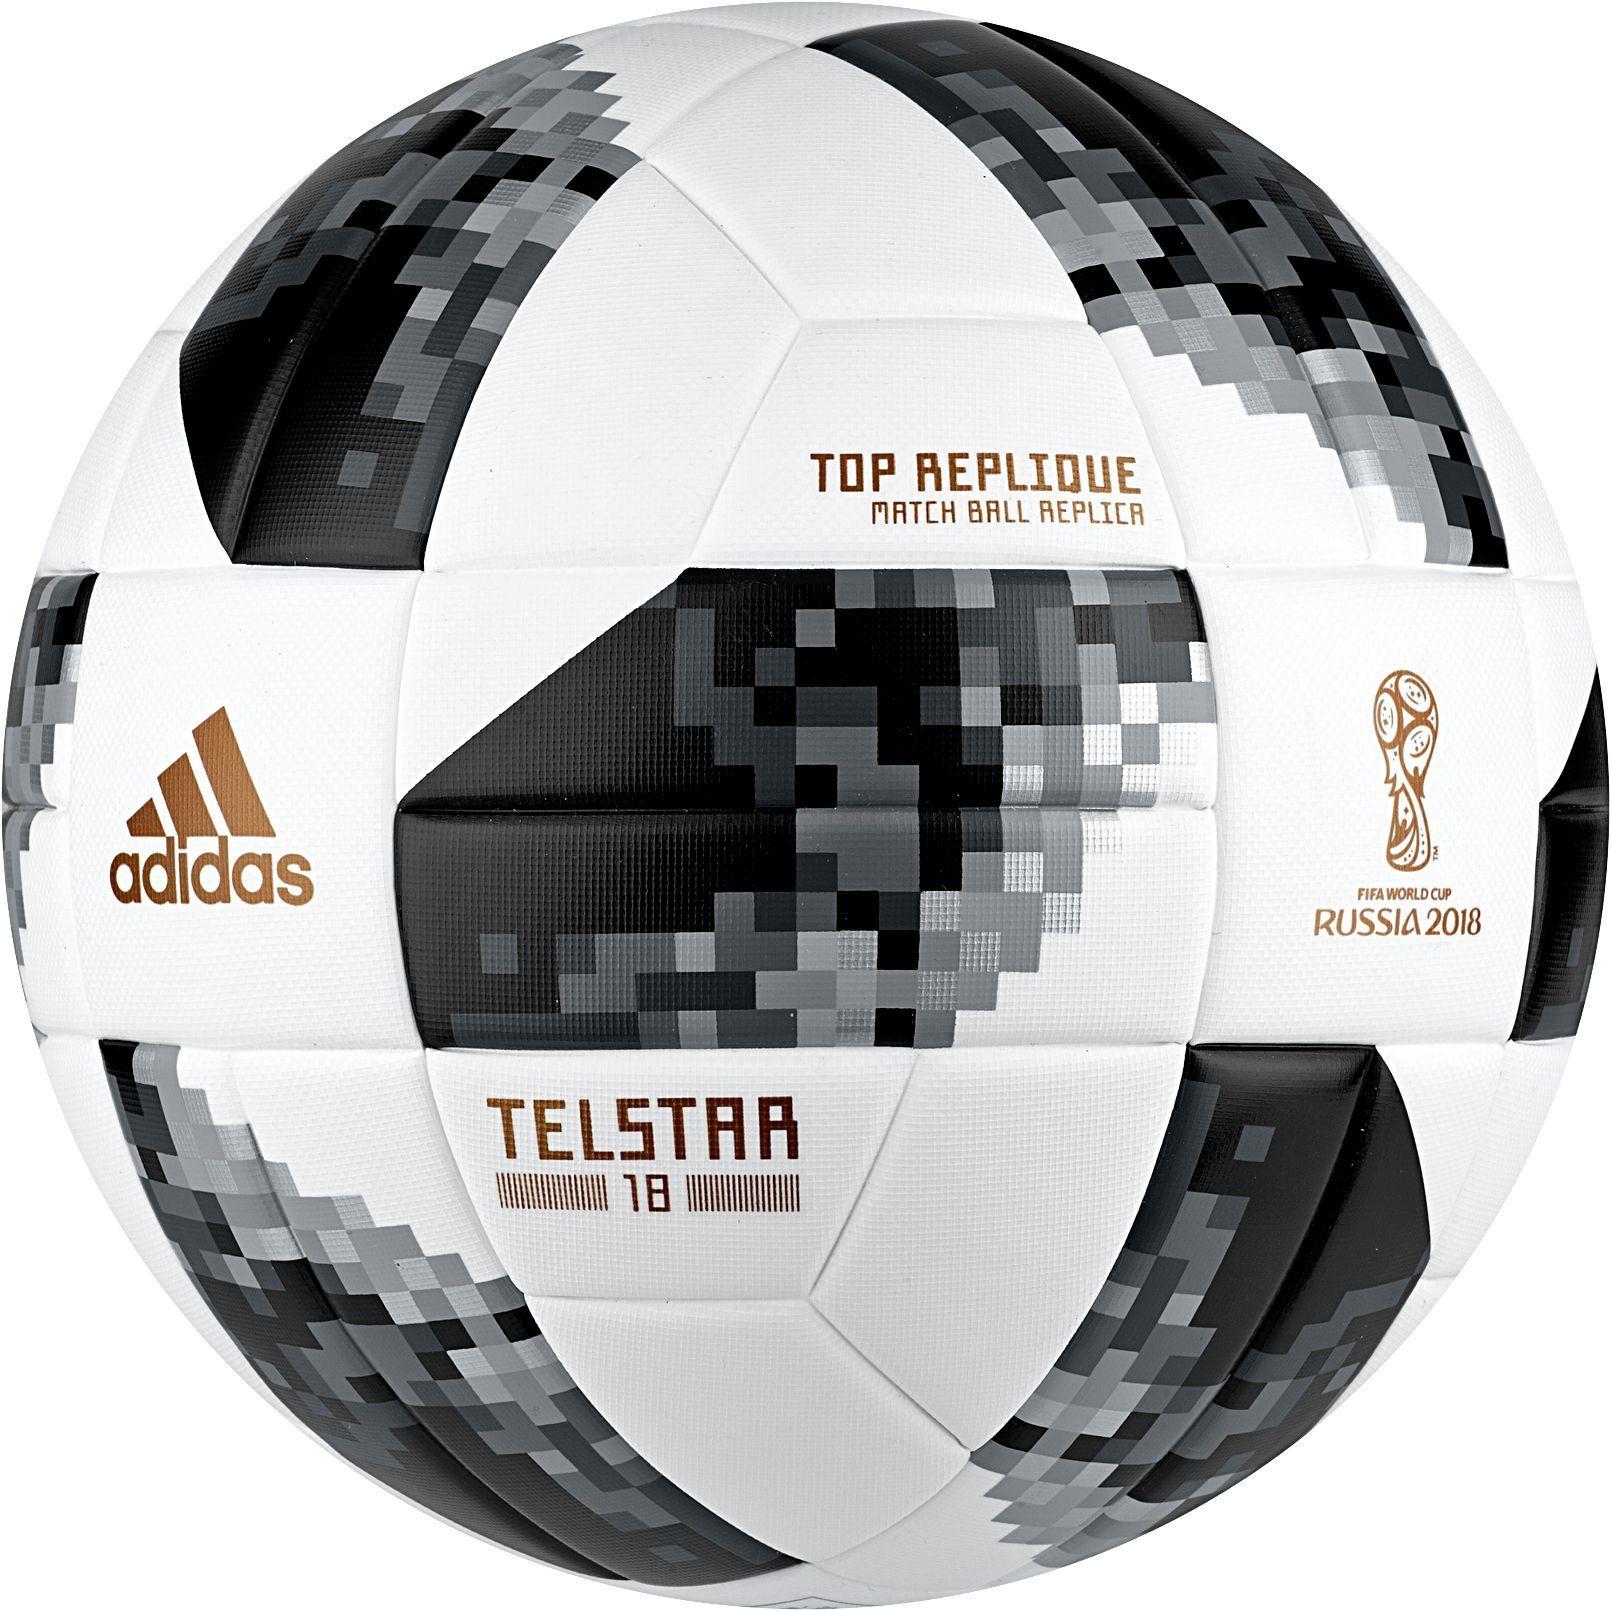 Adidas telstar top replique ball fifa world cup 2018 ball size 5 ... 0d422621a7643